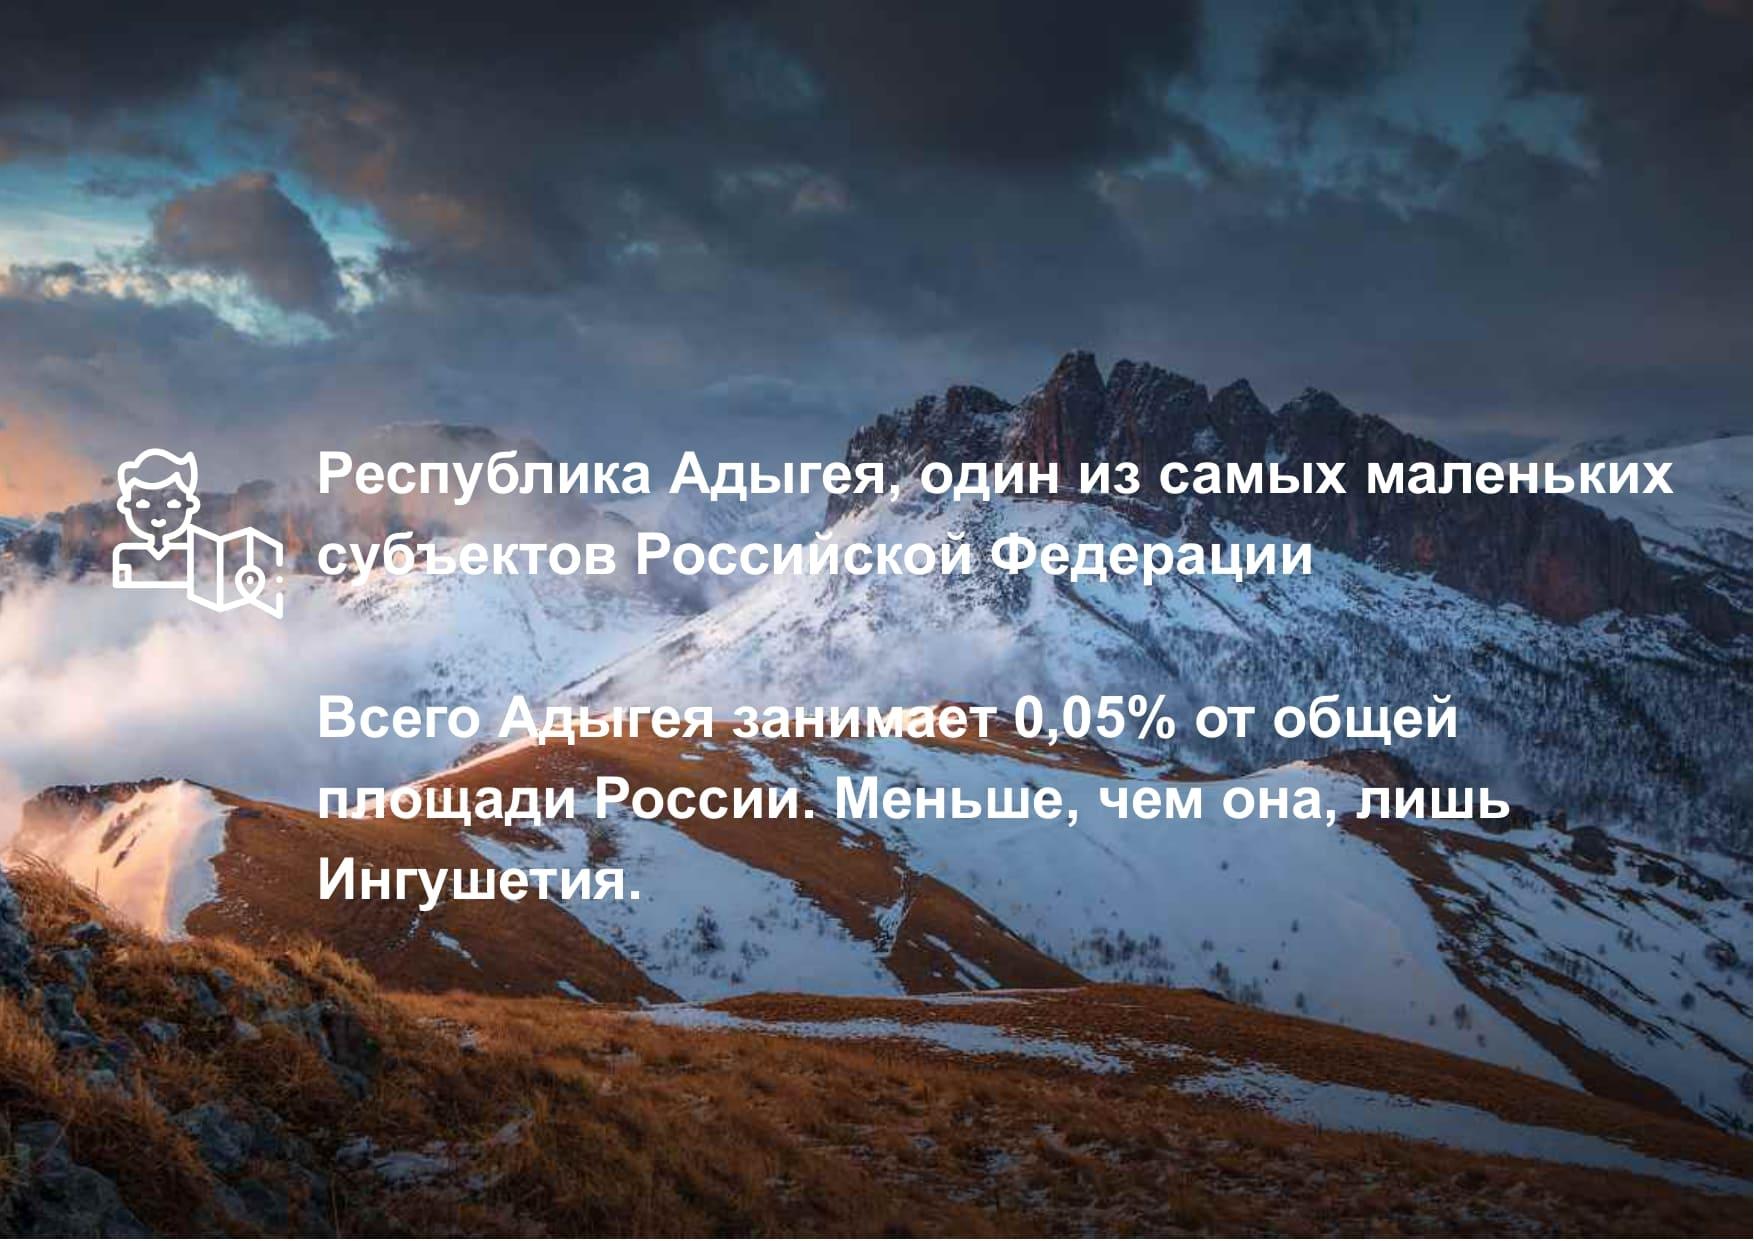 Новогодний Адыгея_compressed (1)_page-0007